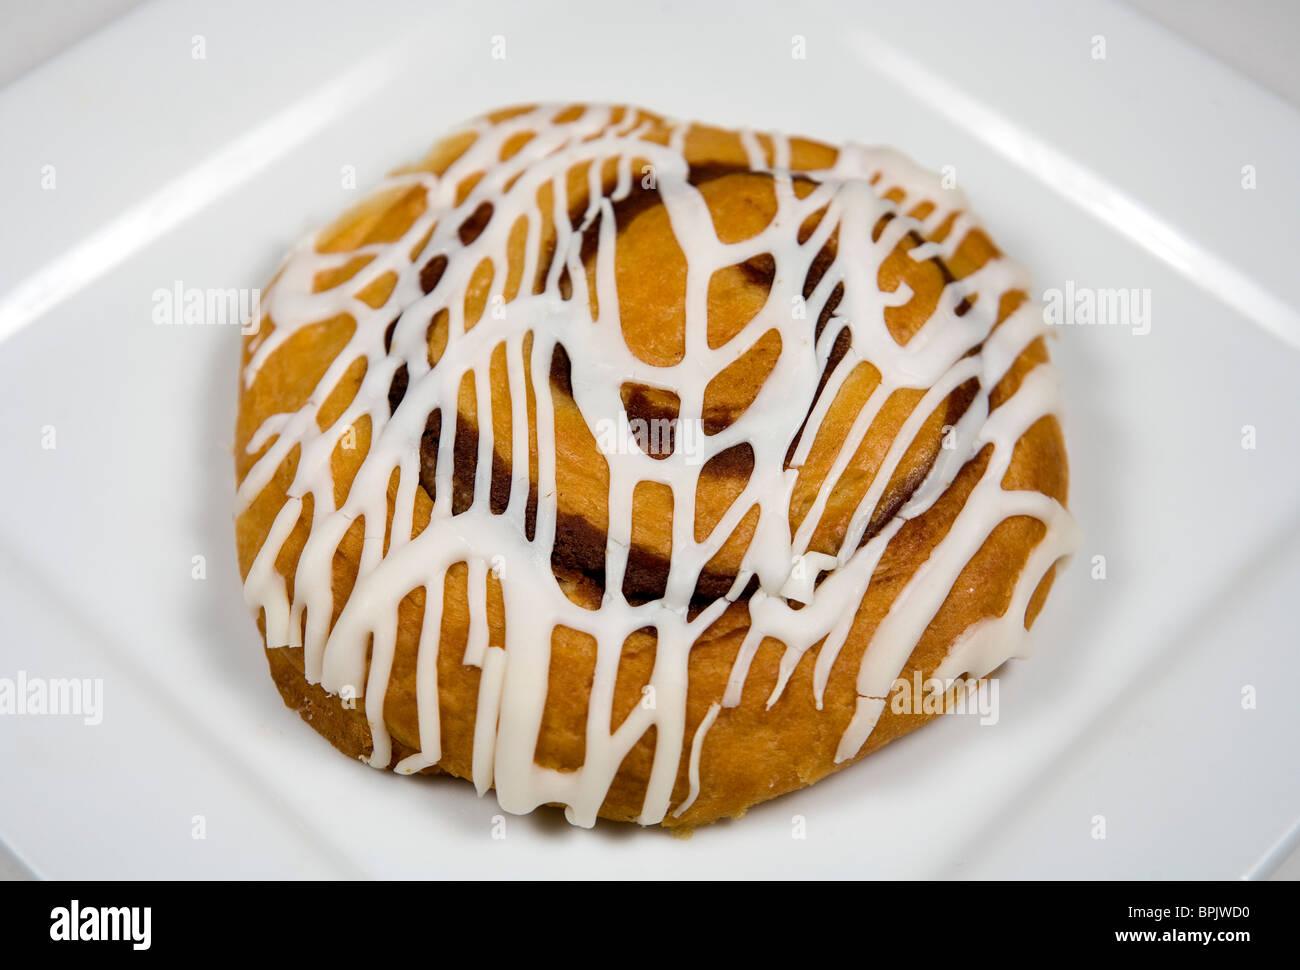 Tastykake iced cinnamon danish. - Stock Image